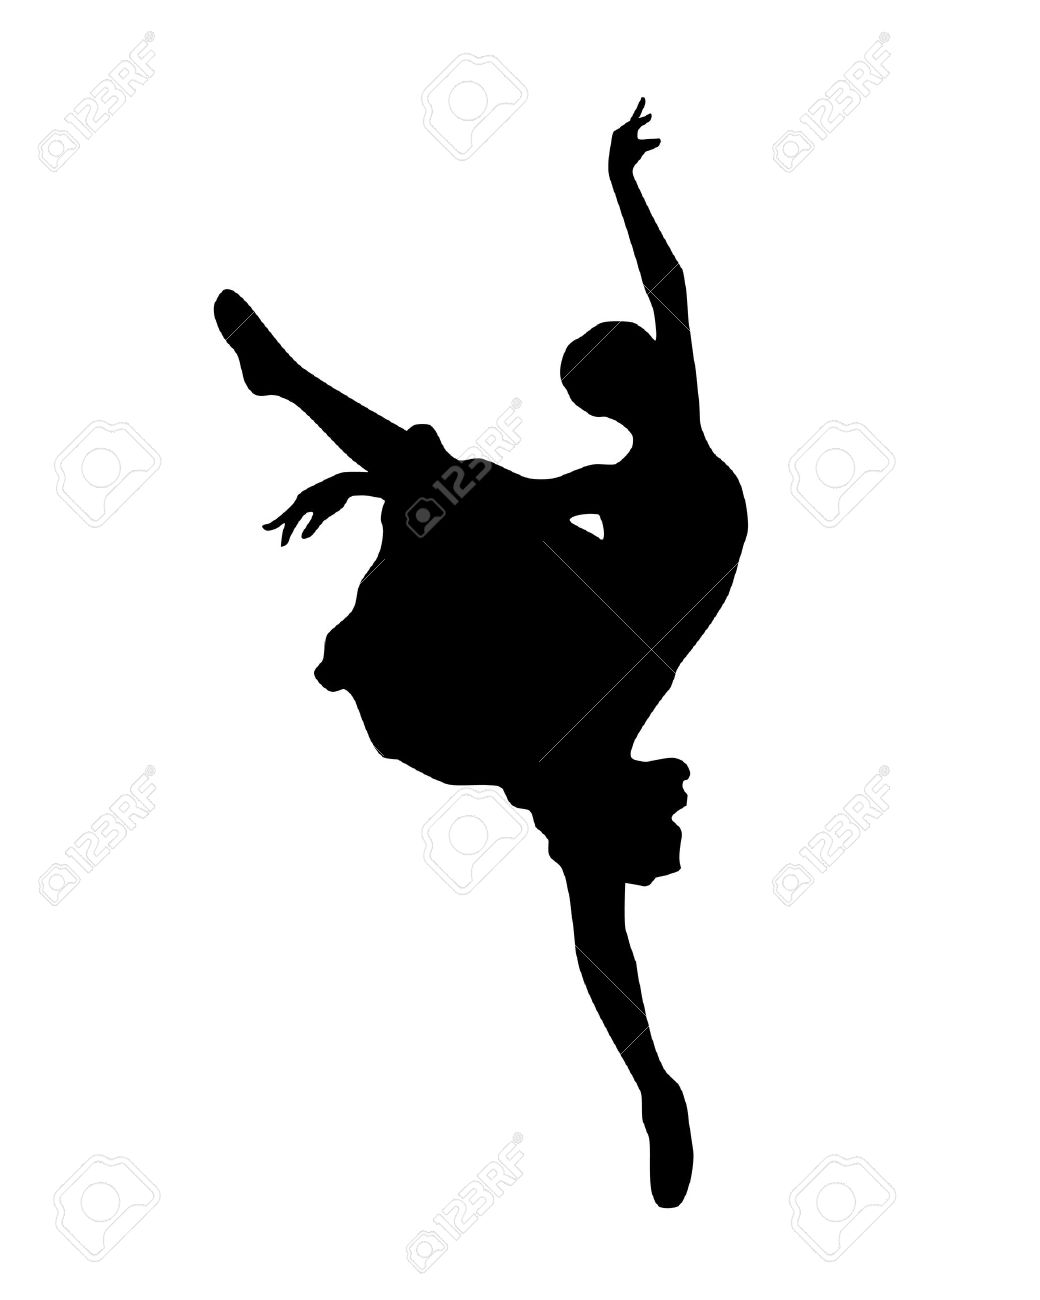 ballerina silhouette Isolated on white background Stock Vector - 14496311